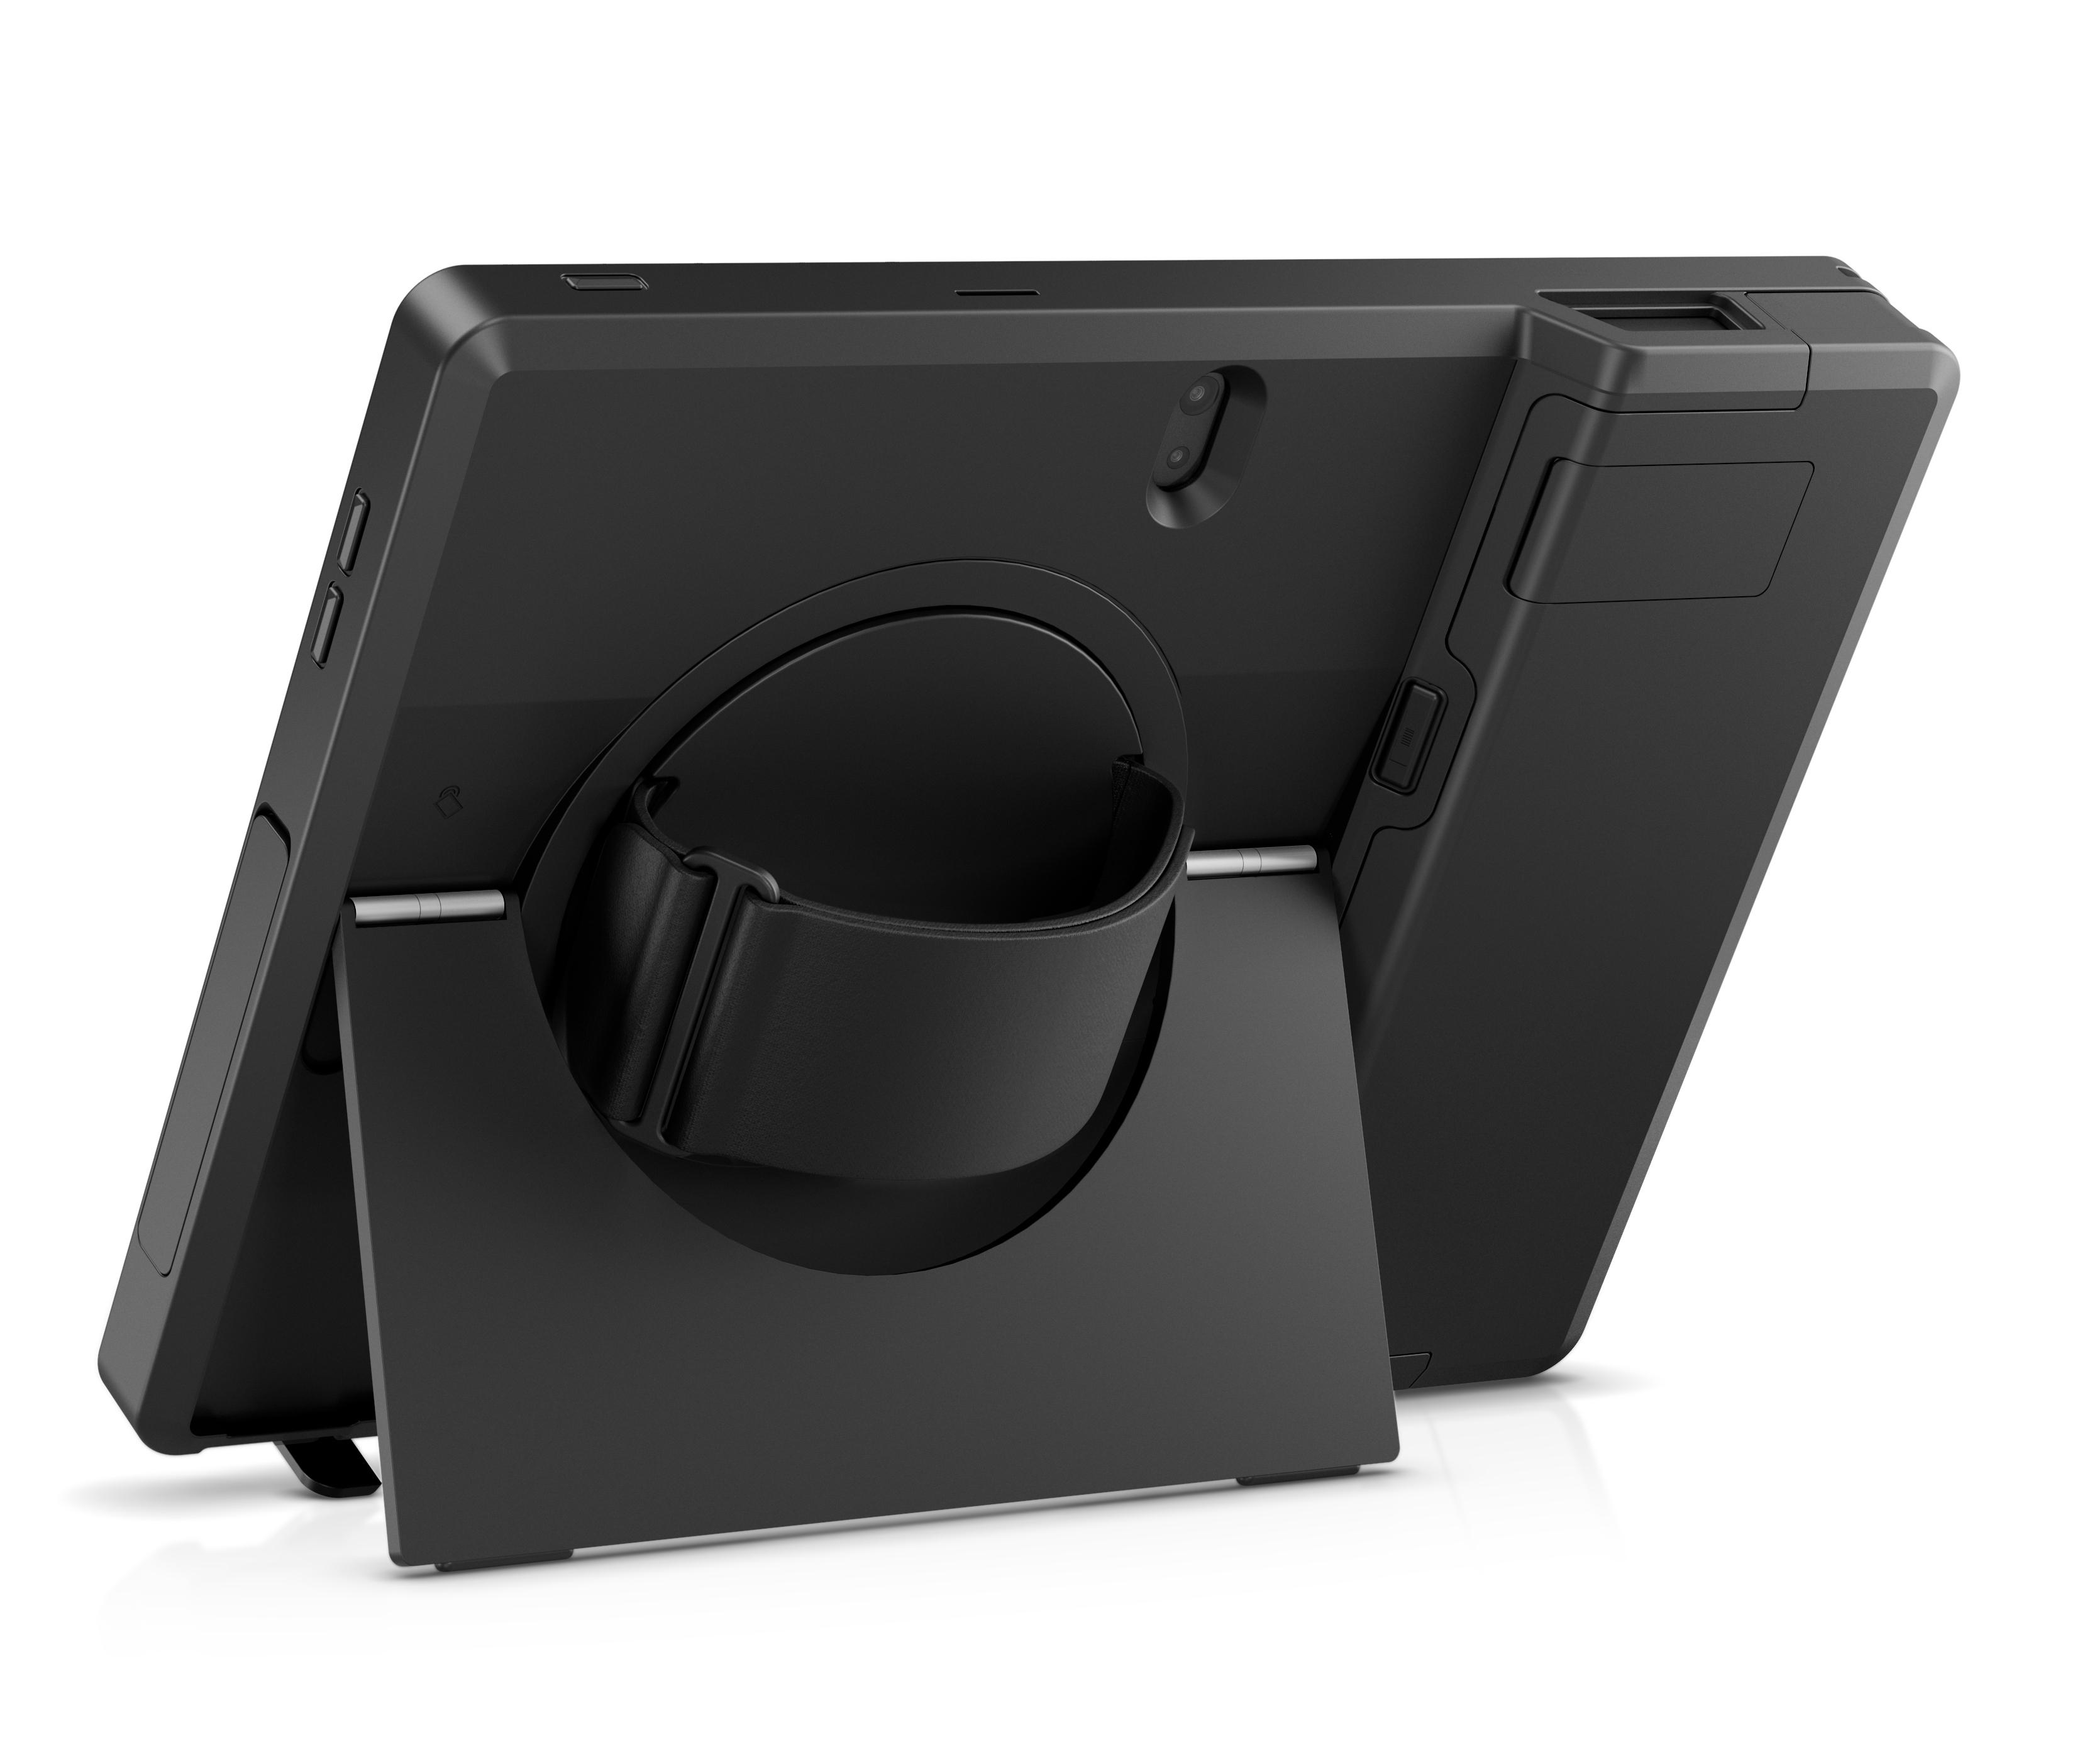 a close up of a computer